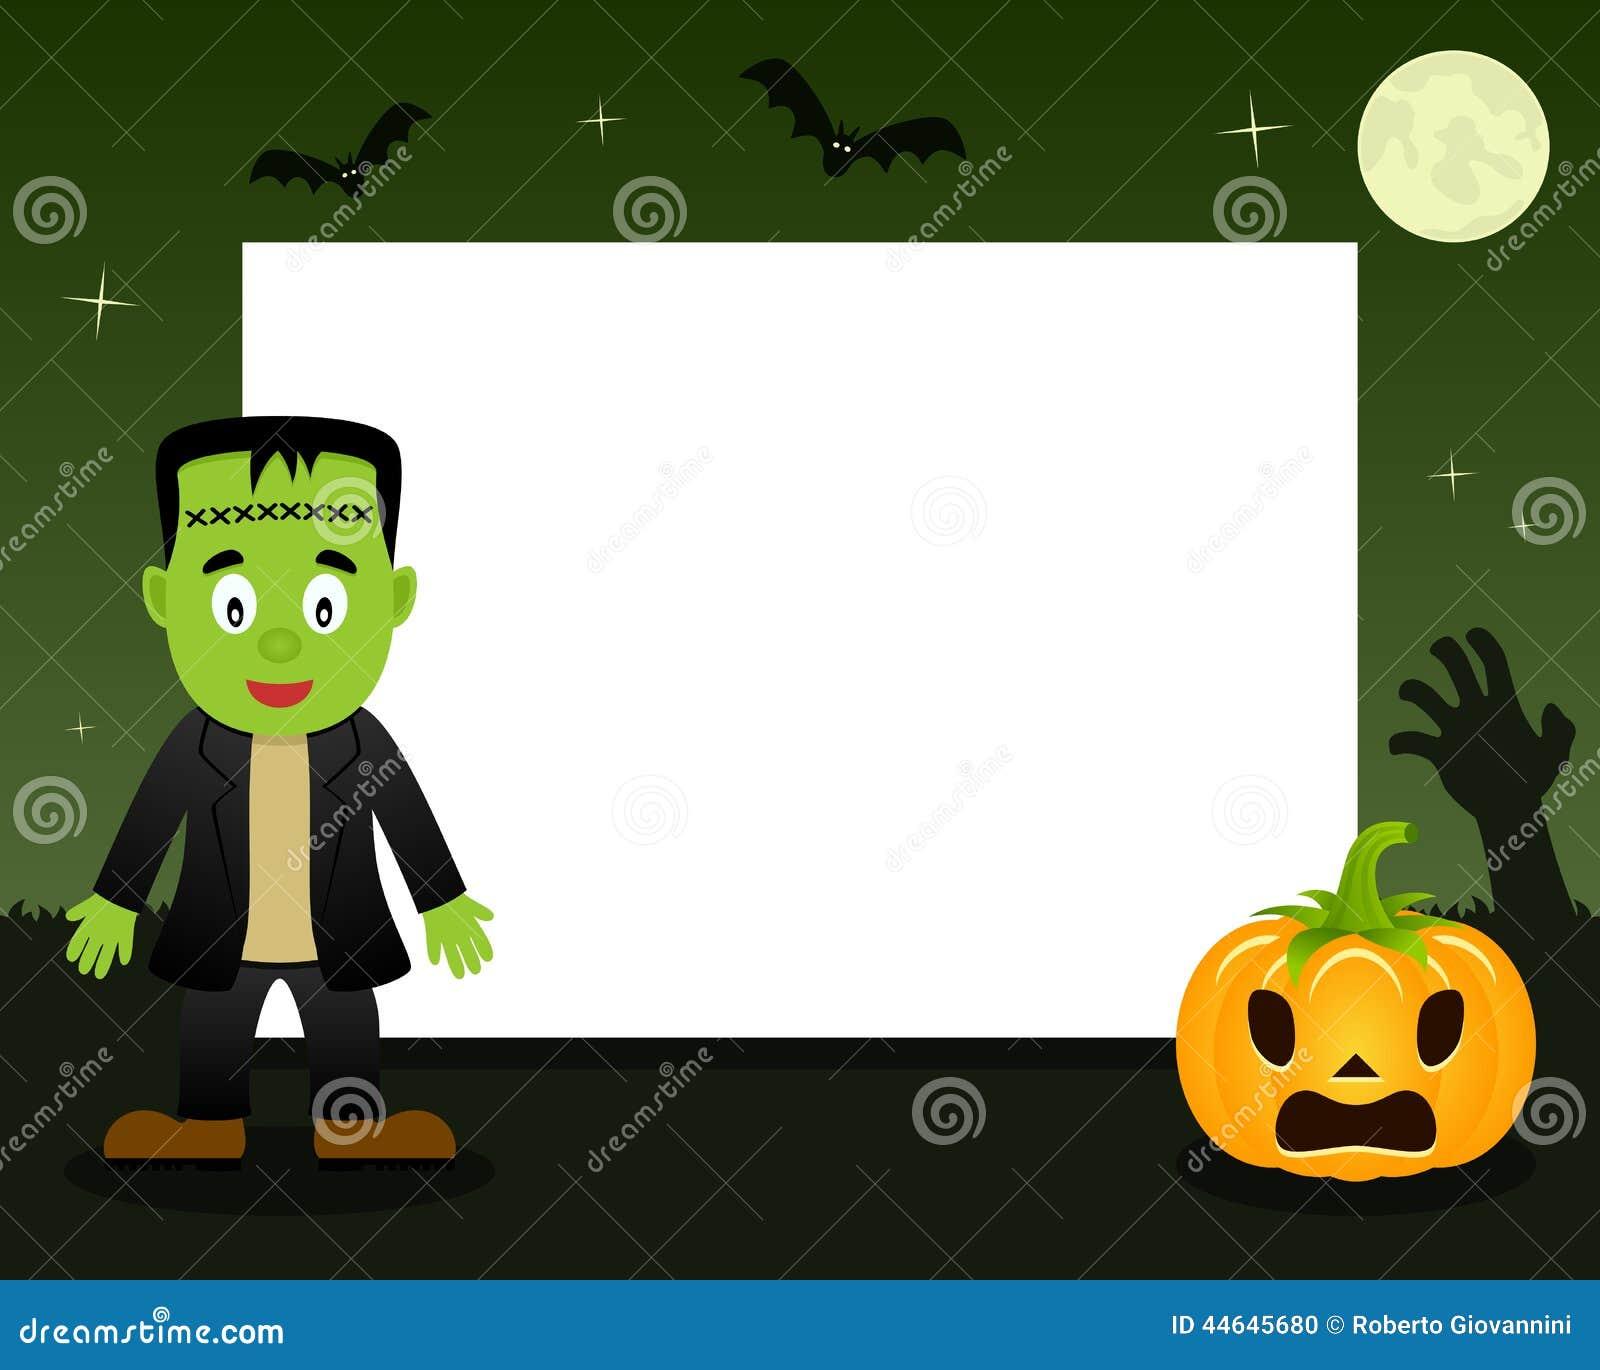 frankenstein halloween horizontal frame illustration 44645680 - megapixl